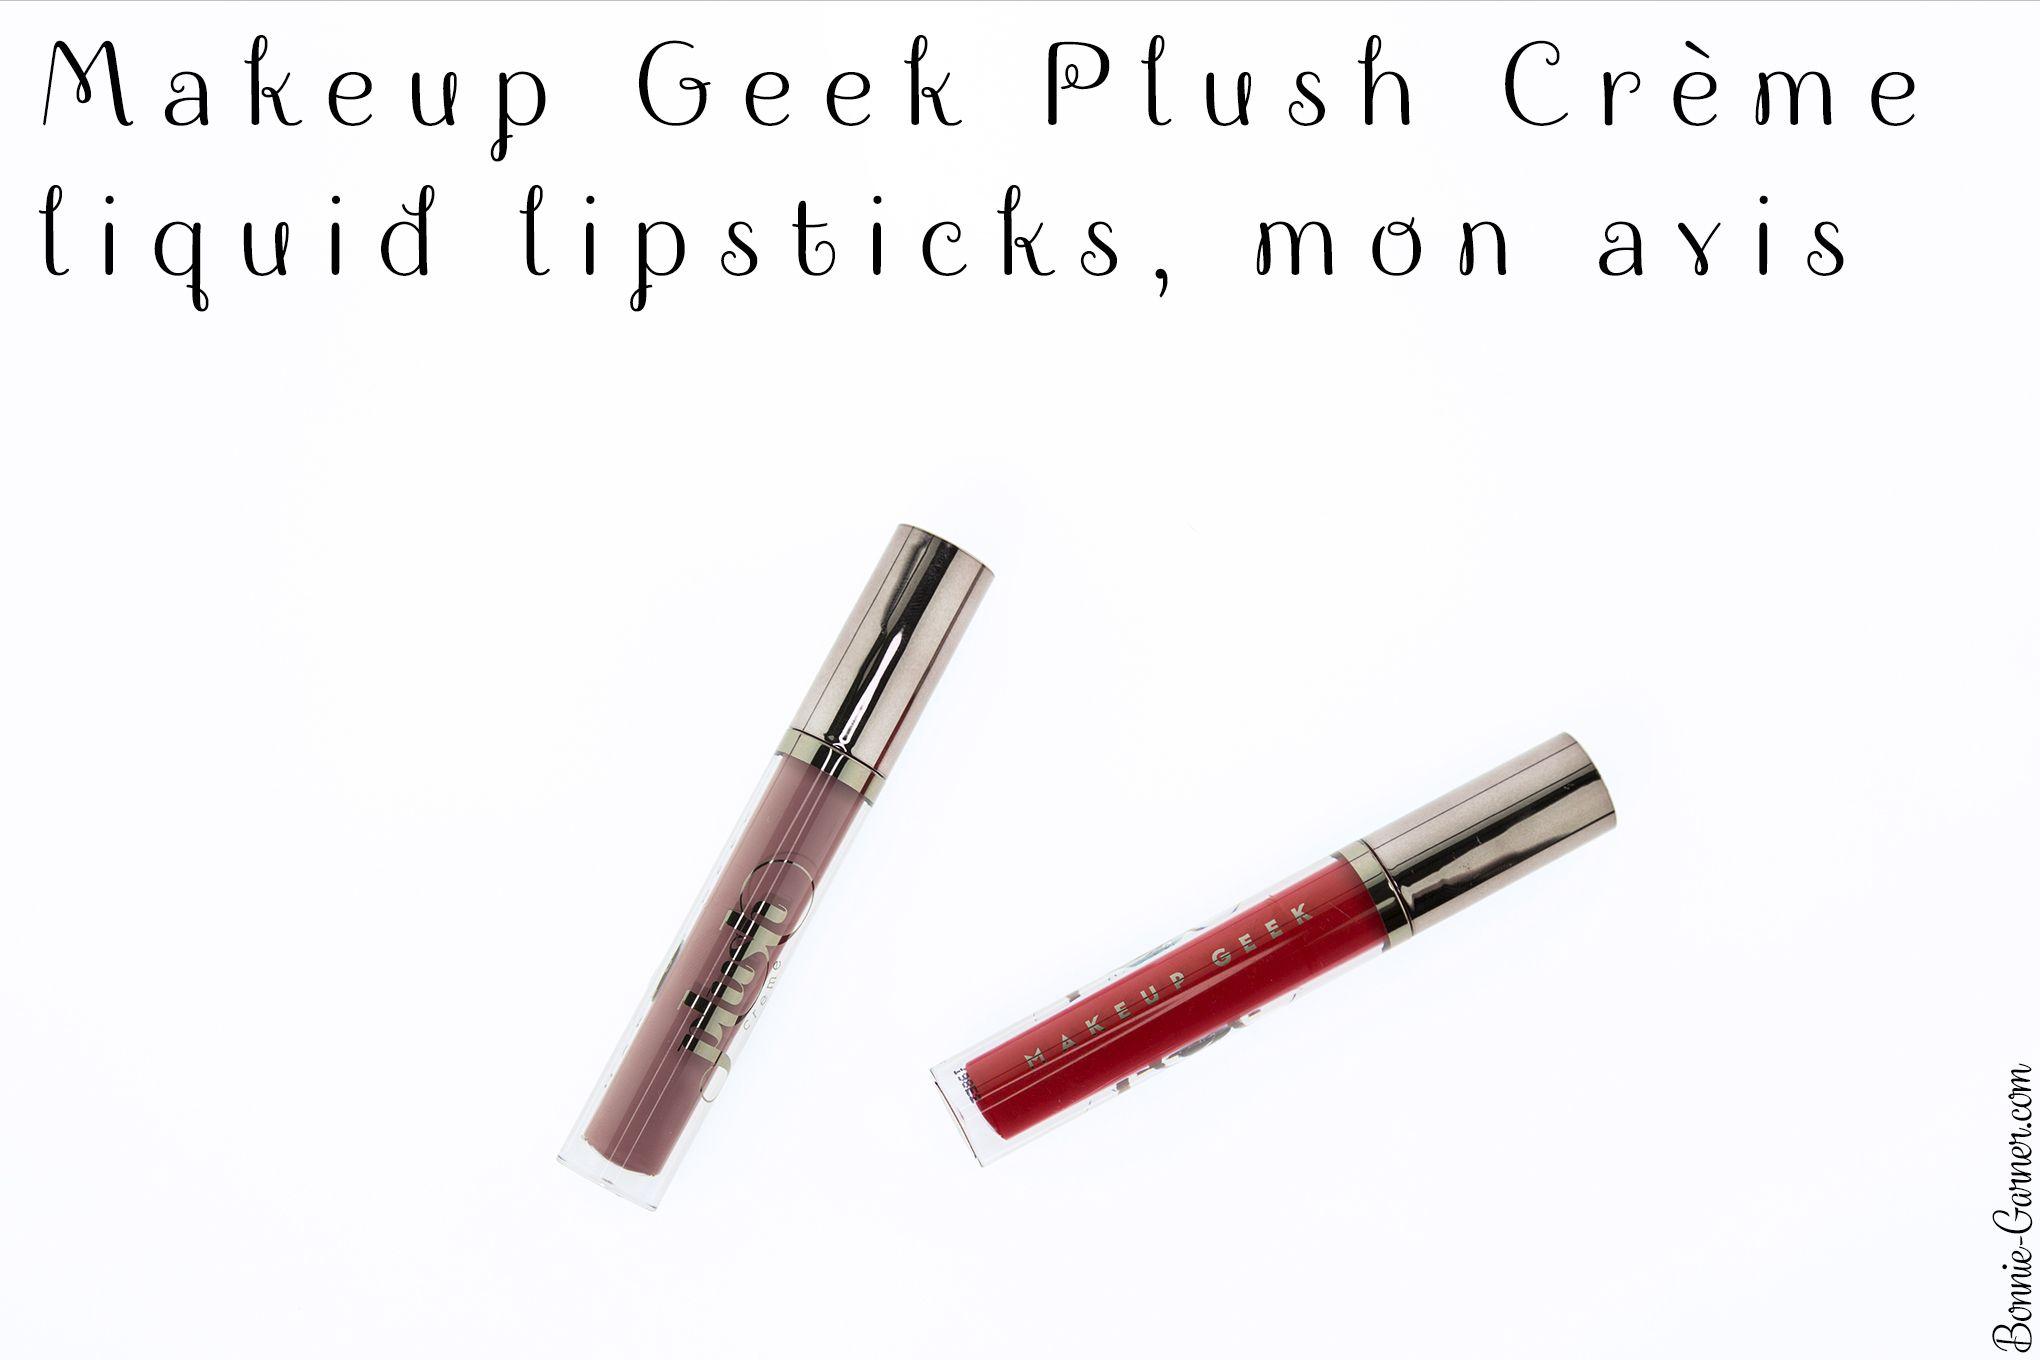 Makeup Geek Plush Crème liquid lipsticks, mon avis